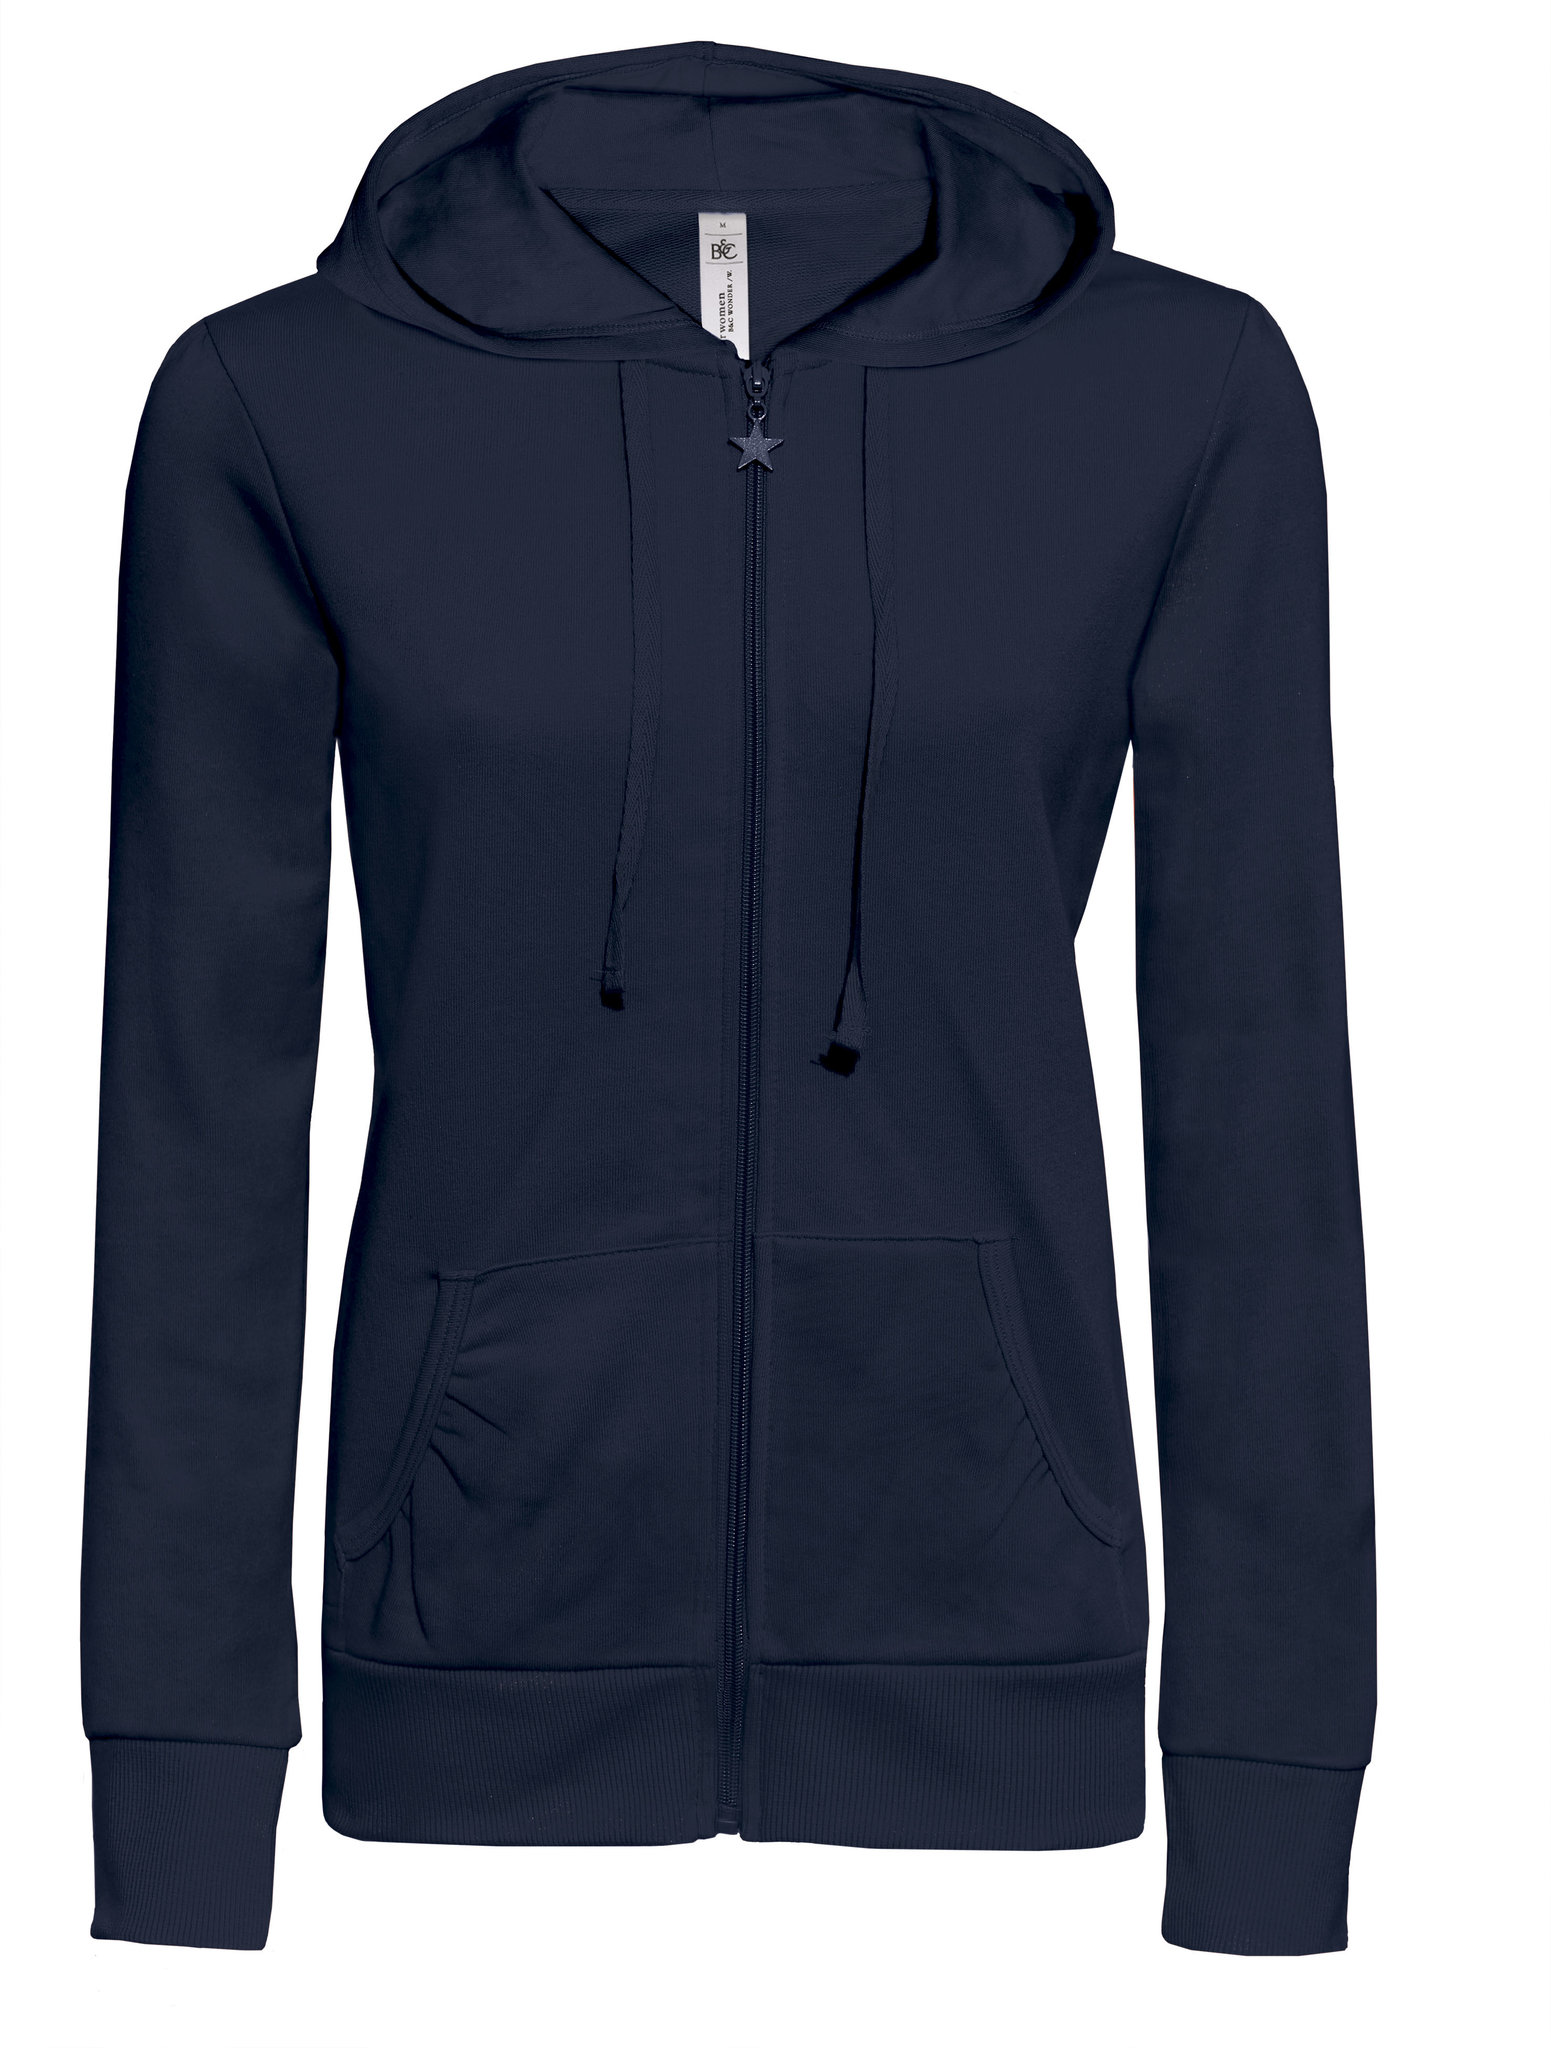 Sweatshirt promotionnel Wonder noir - sweatshirt publicitaire